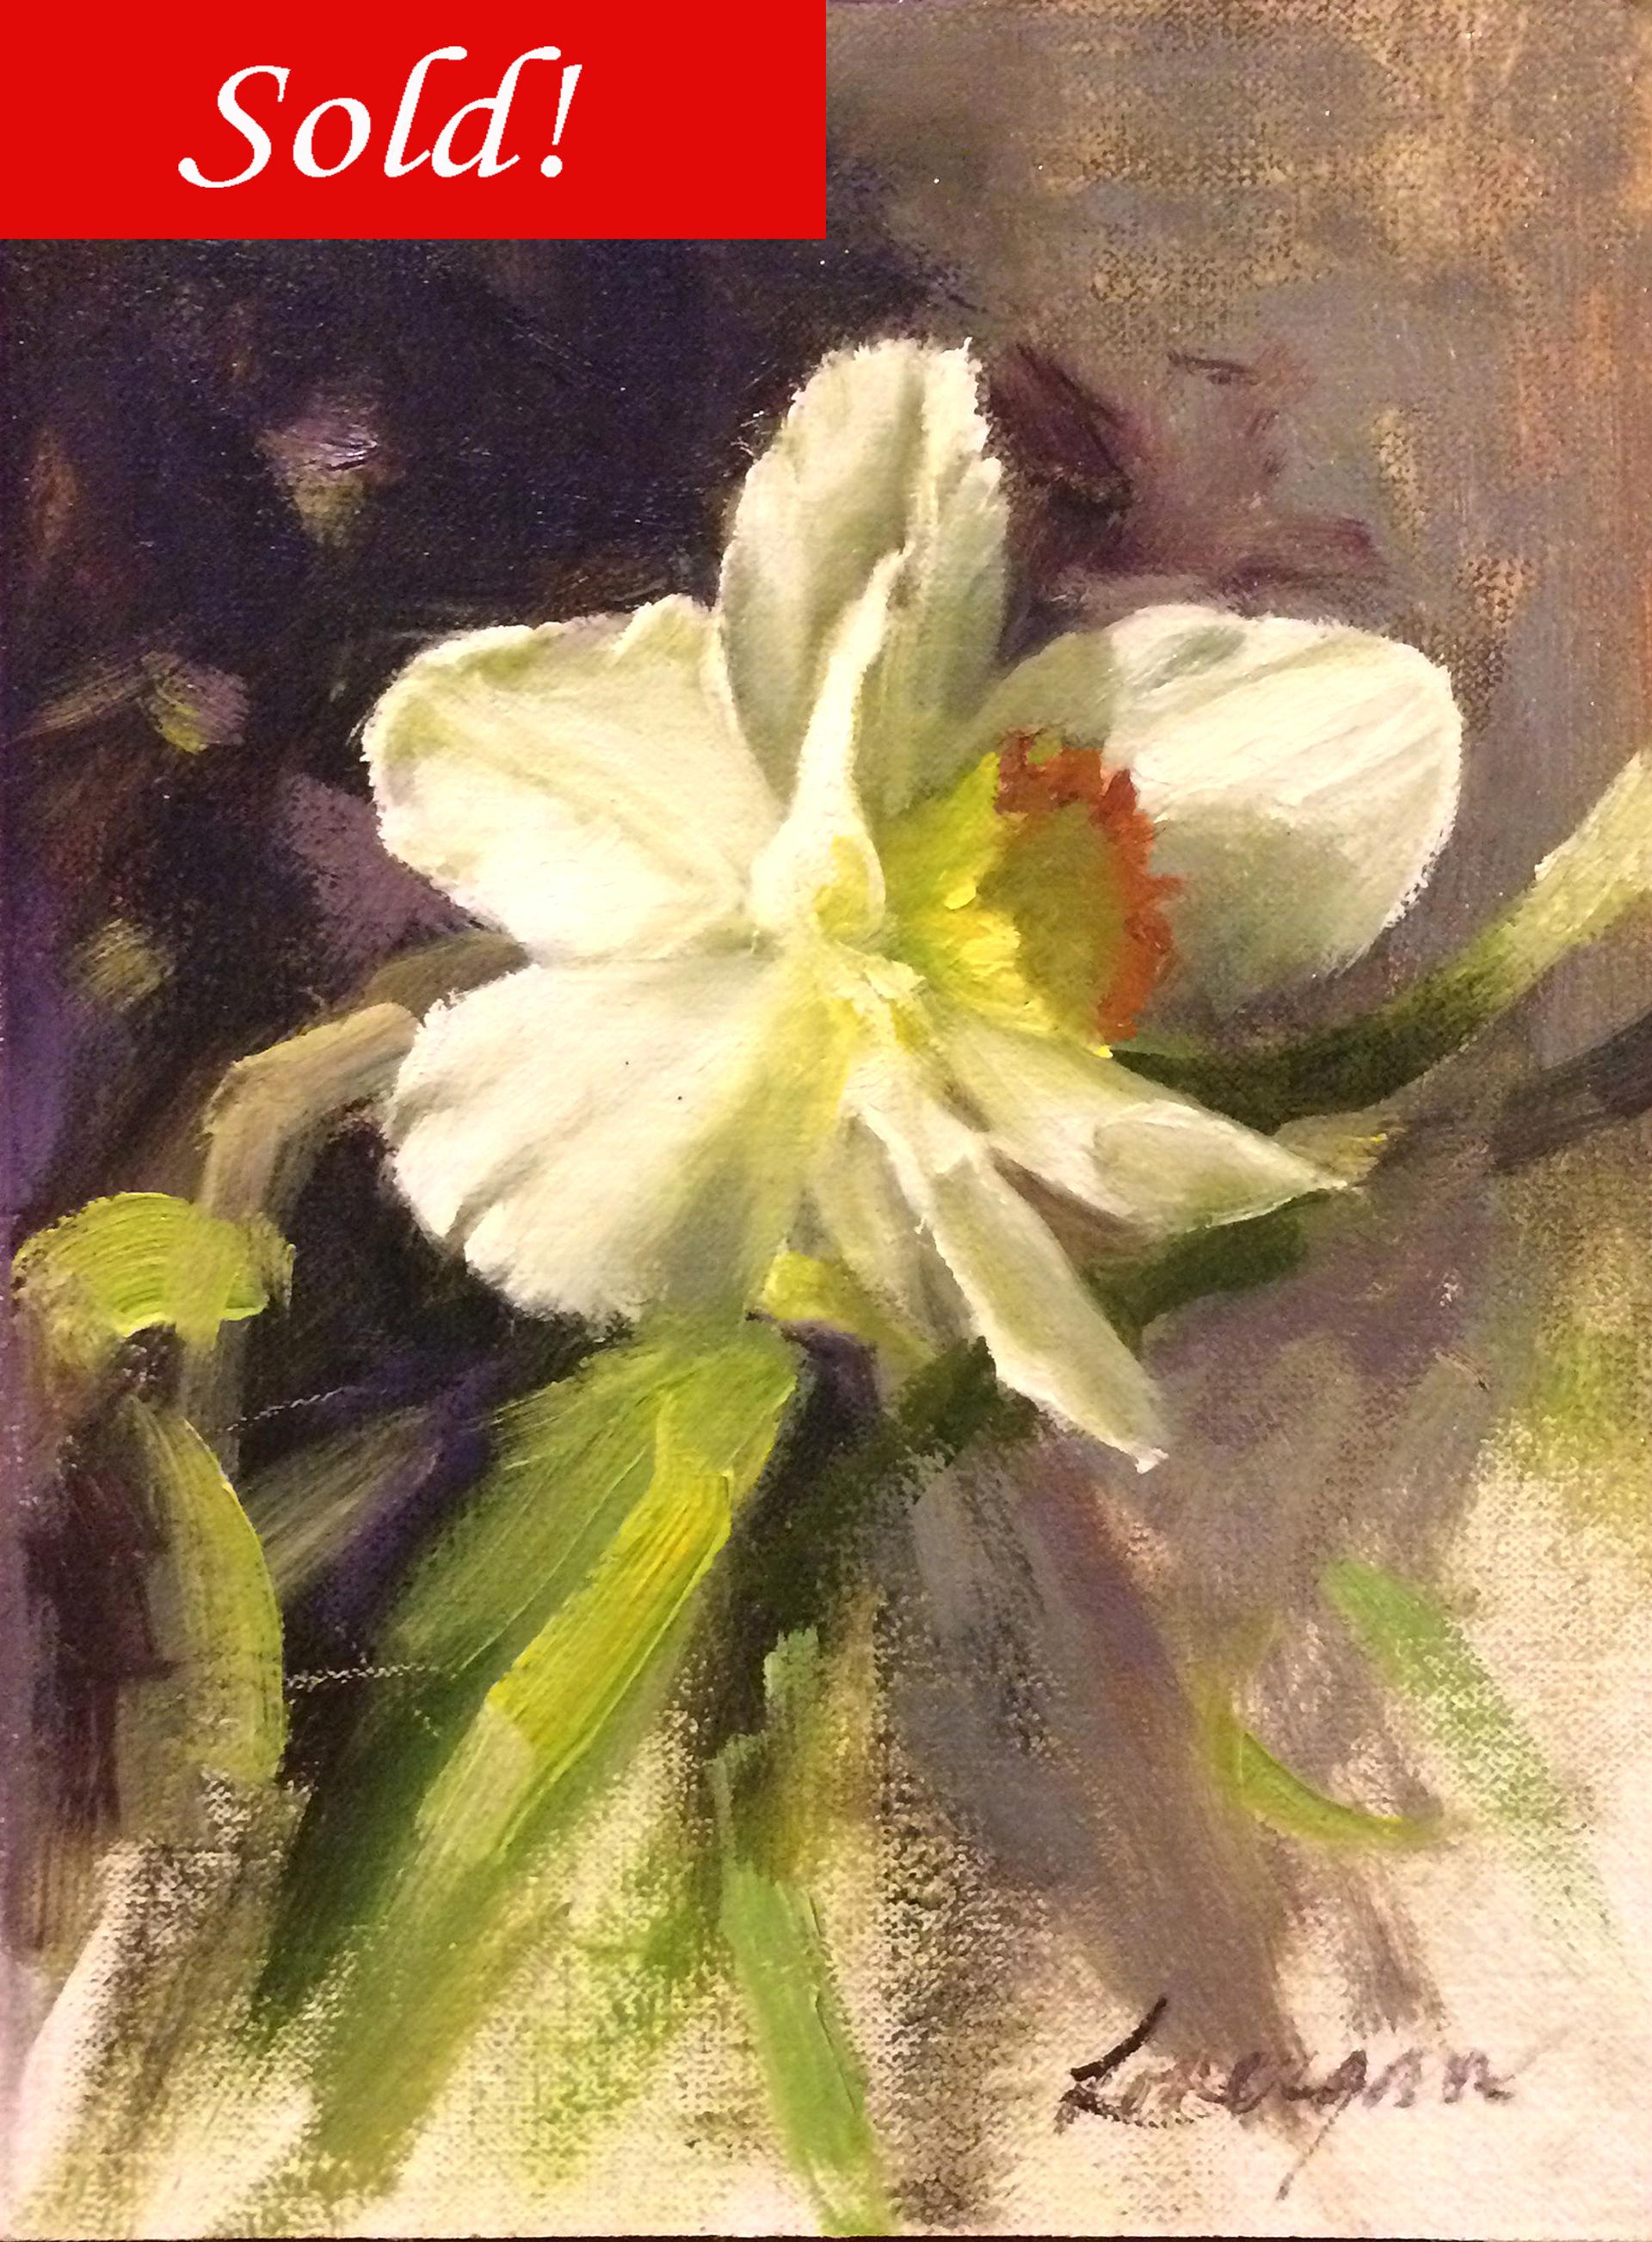 Daffodil by John Lonergan